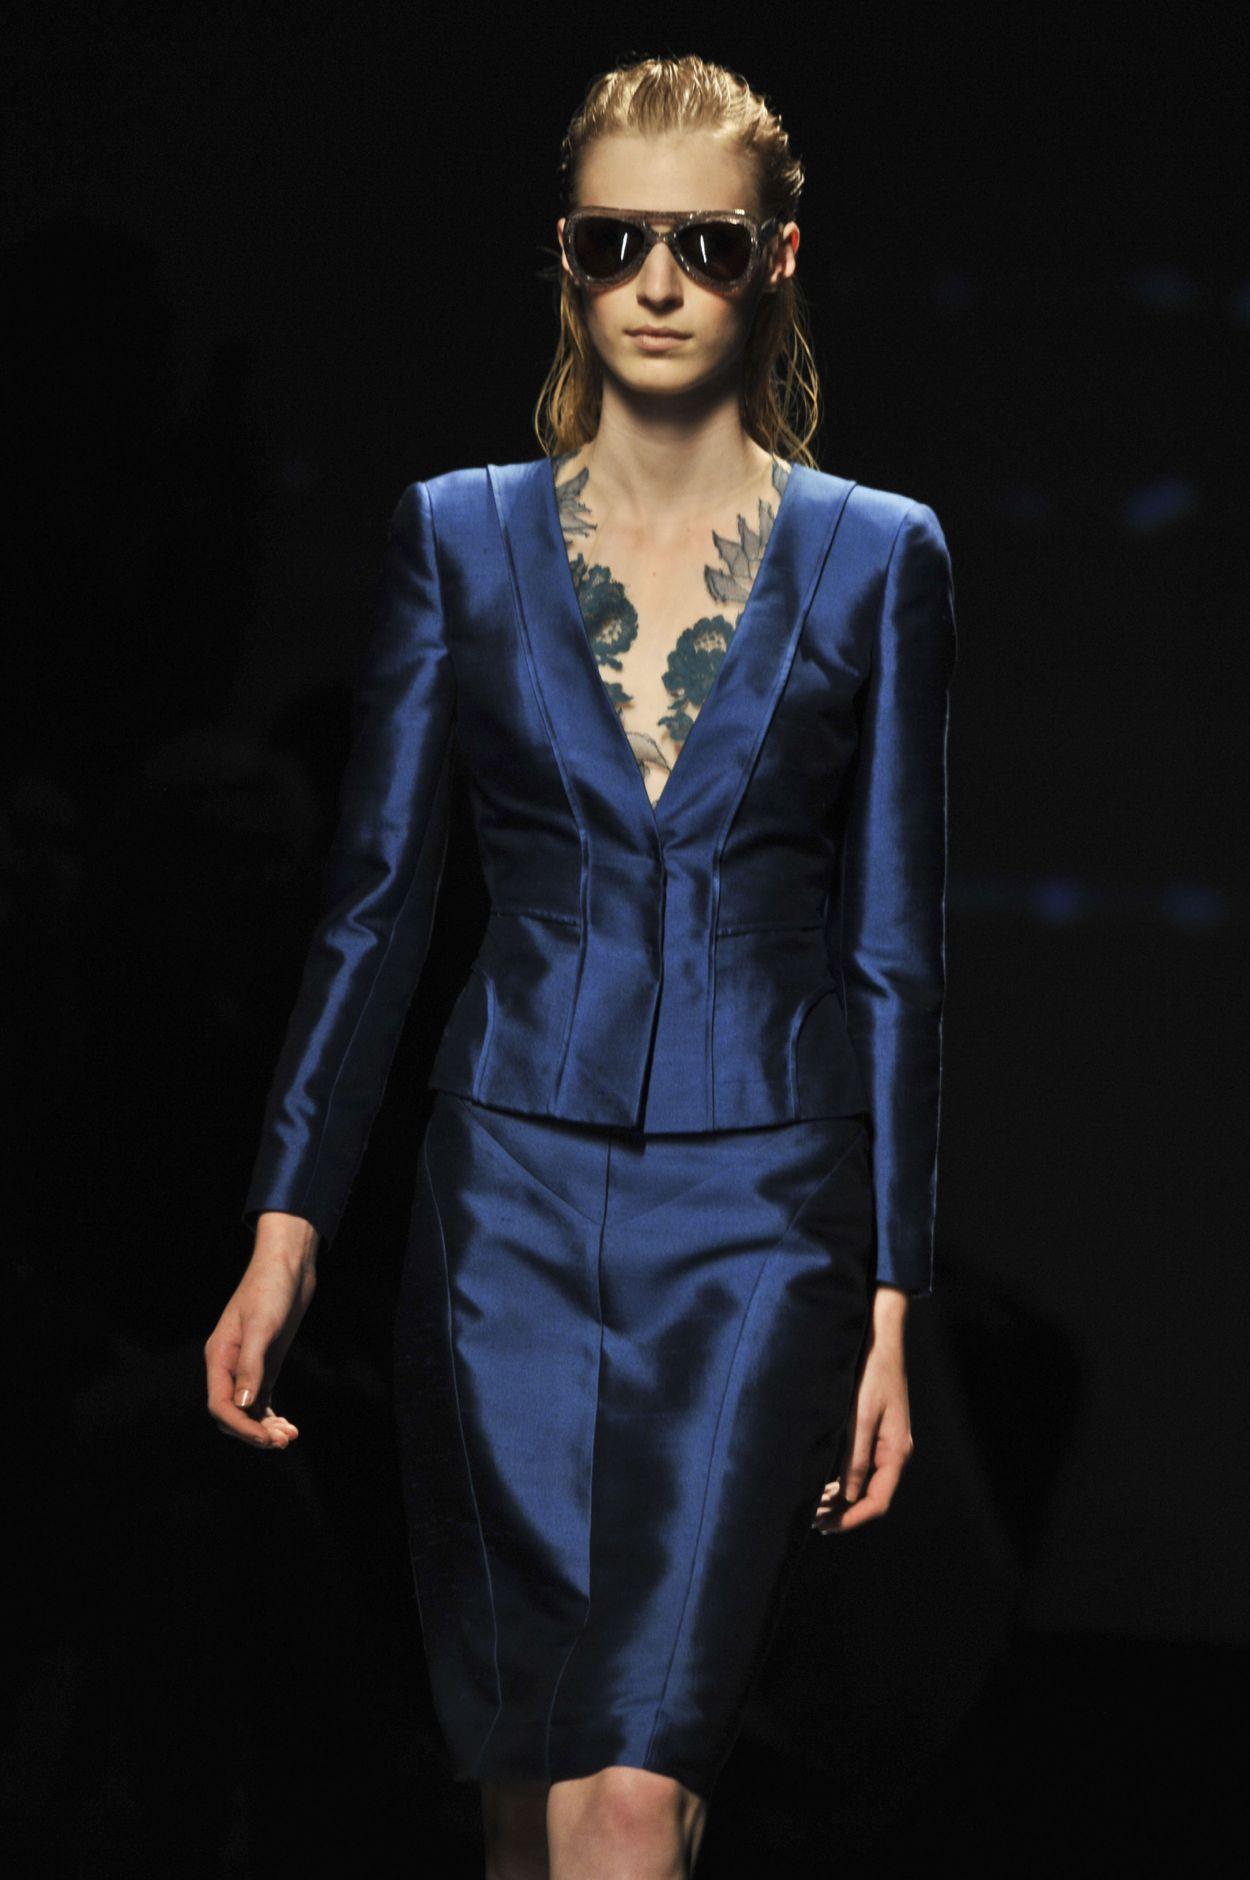 Alberta Ferretti Spring 2013 Collection Milano Fashion Week